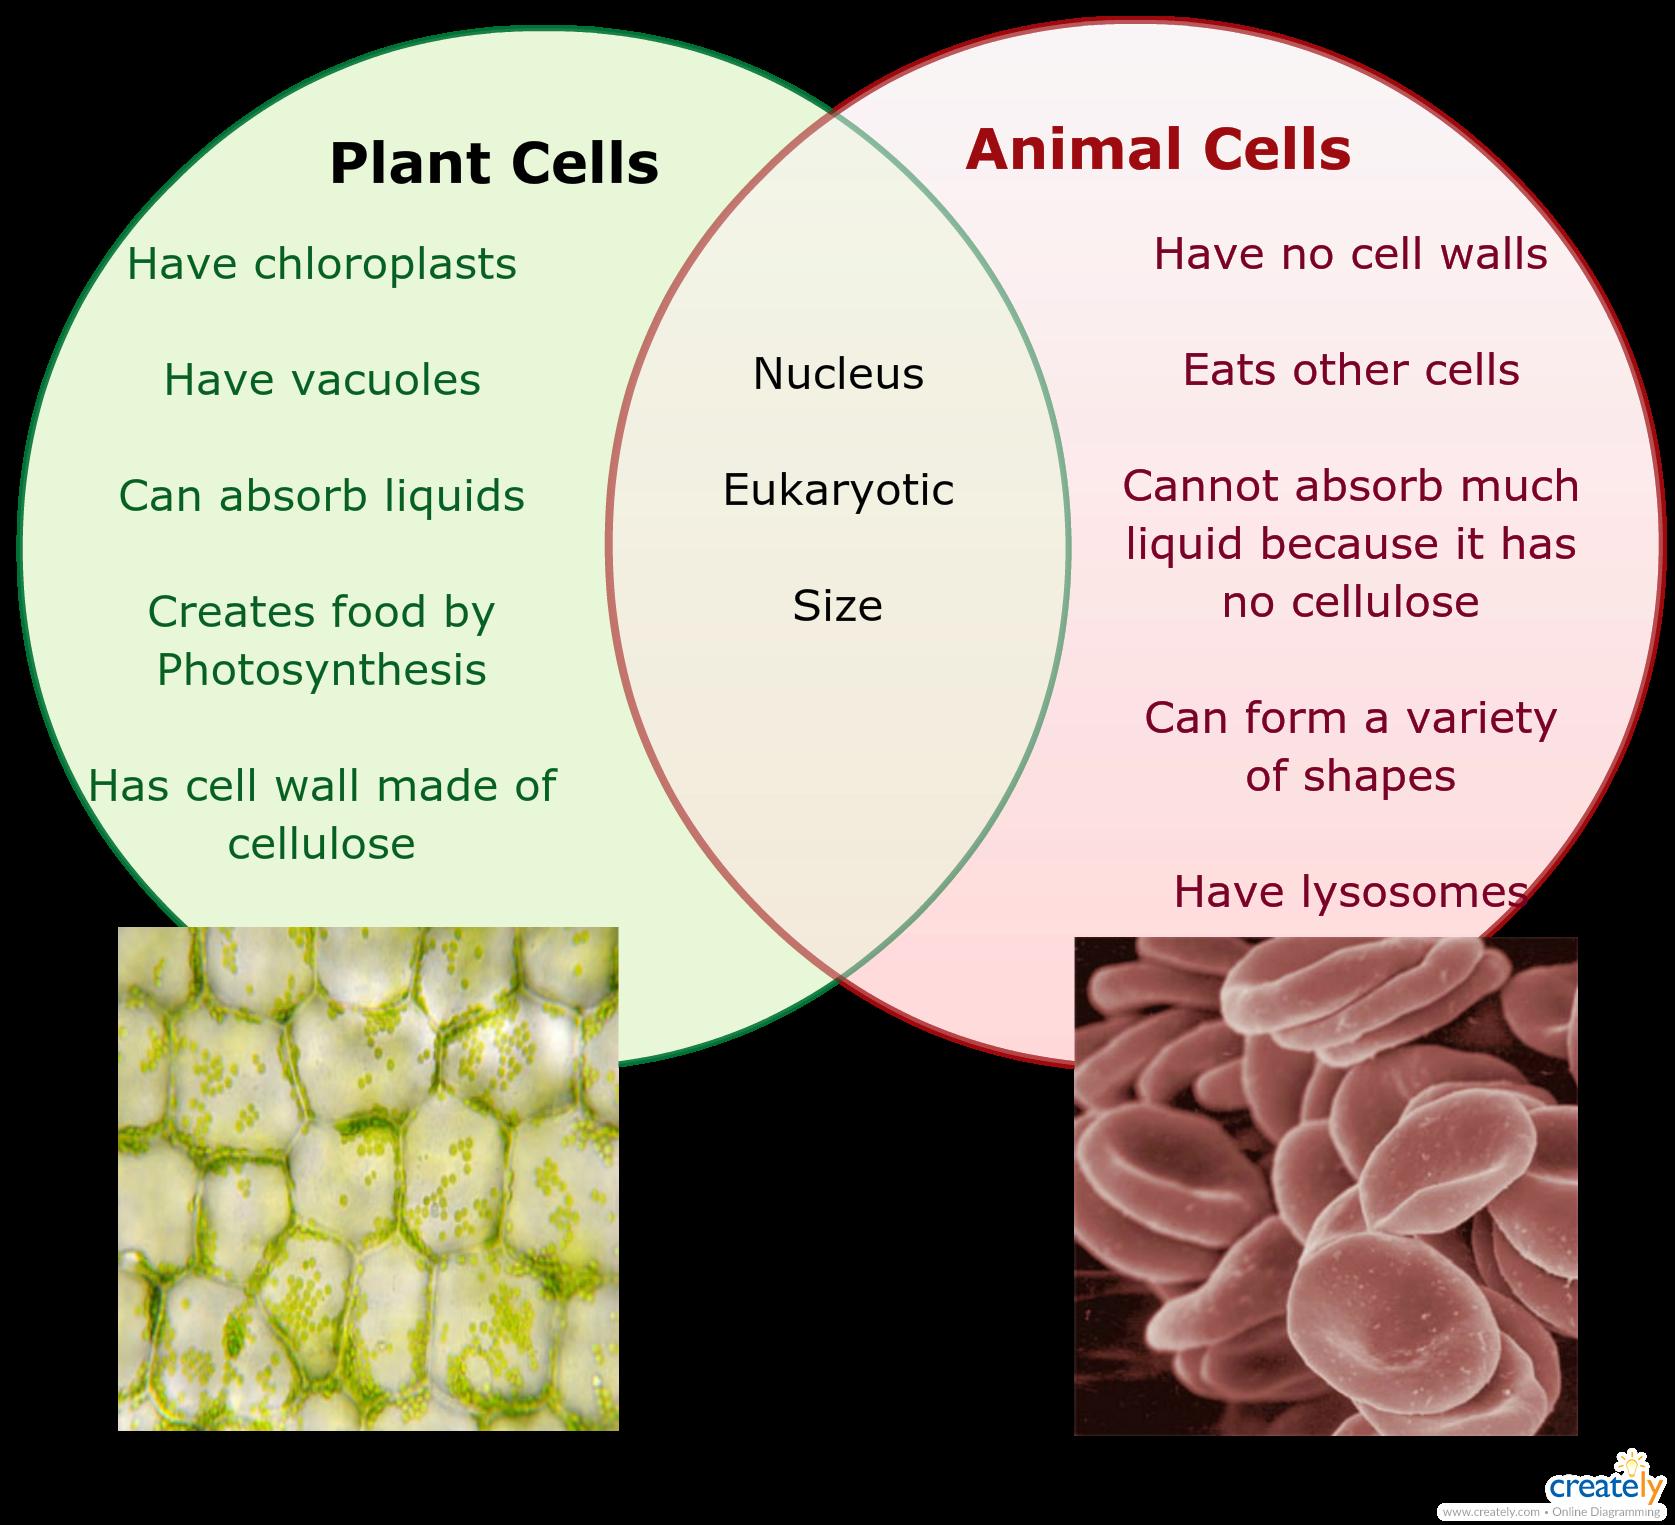 medium resolution of plant vs animal cells venn diagram for educational purposes venn diagram